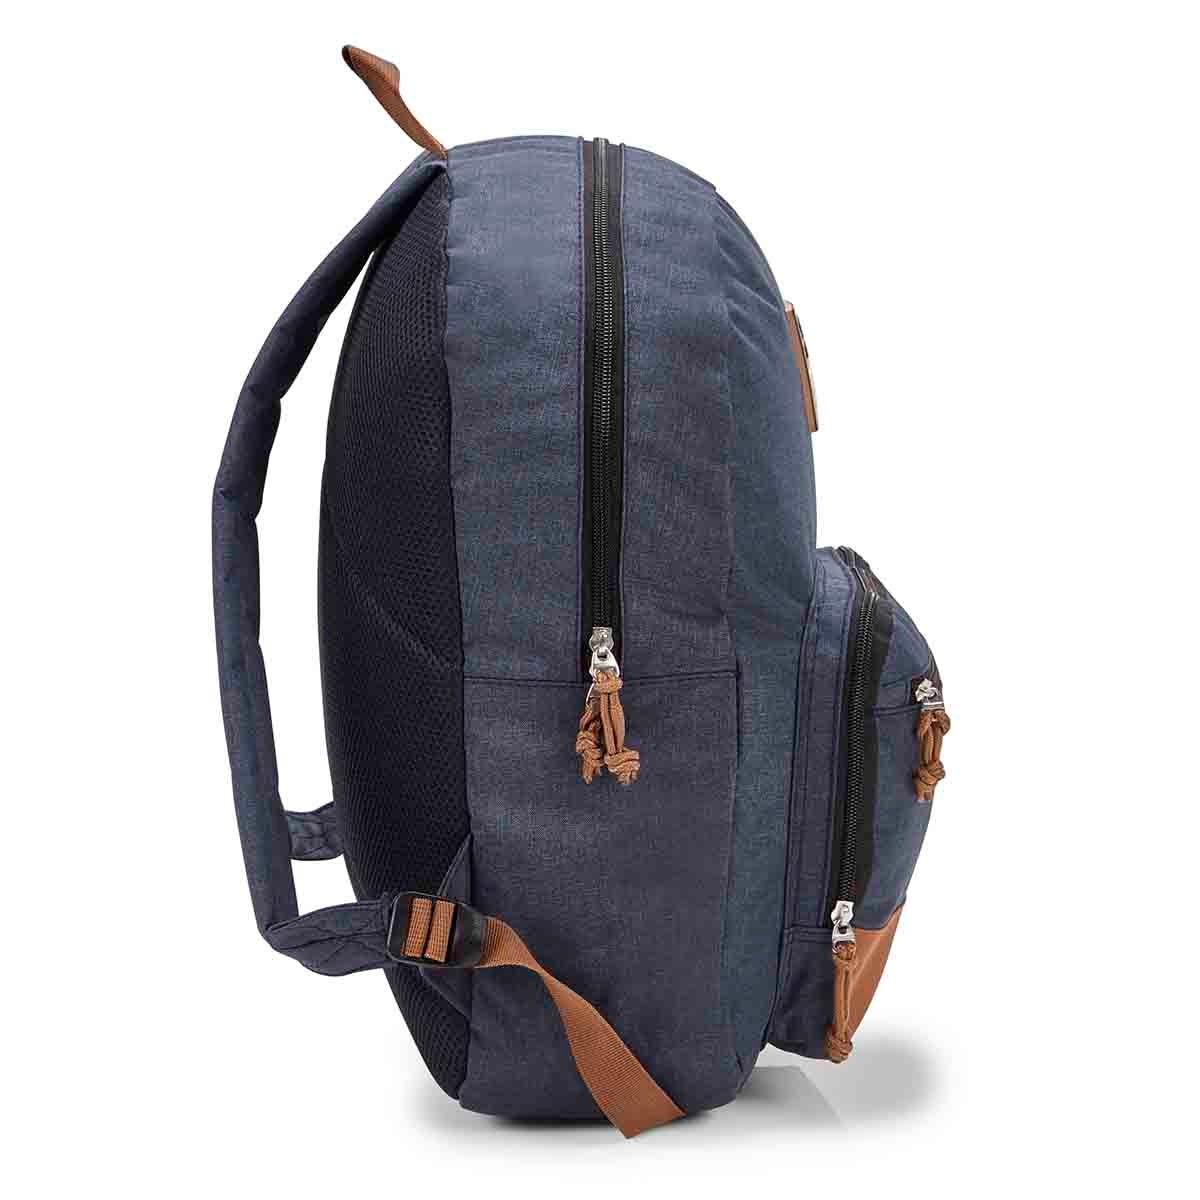 Unisex Simple Everyday Navy/Tan Backpack